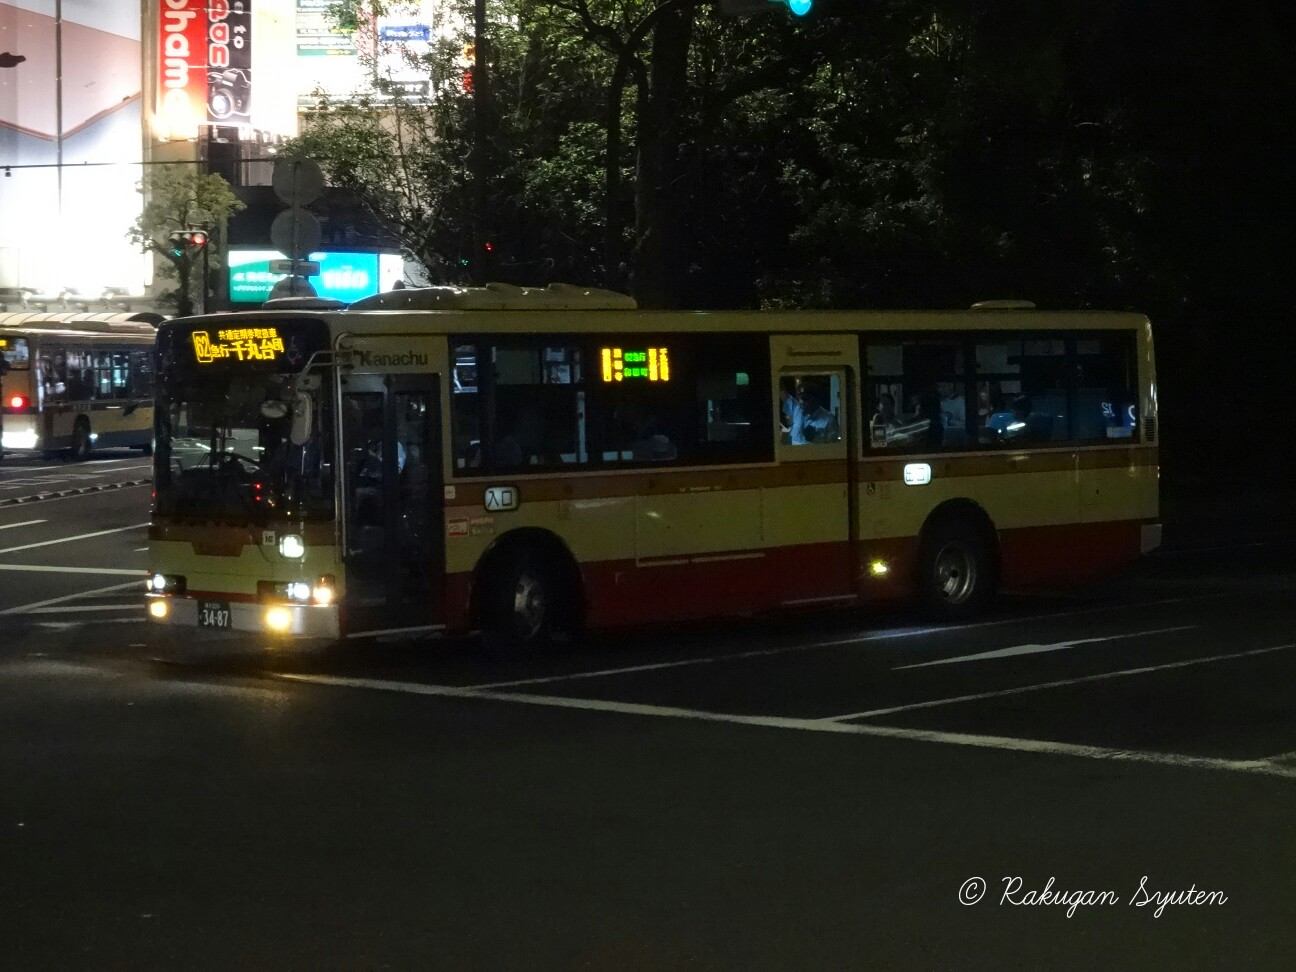 f:id:OkitsuPier:20160905002156j:image